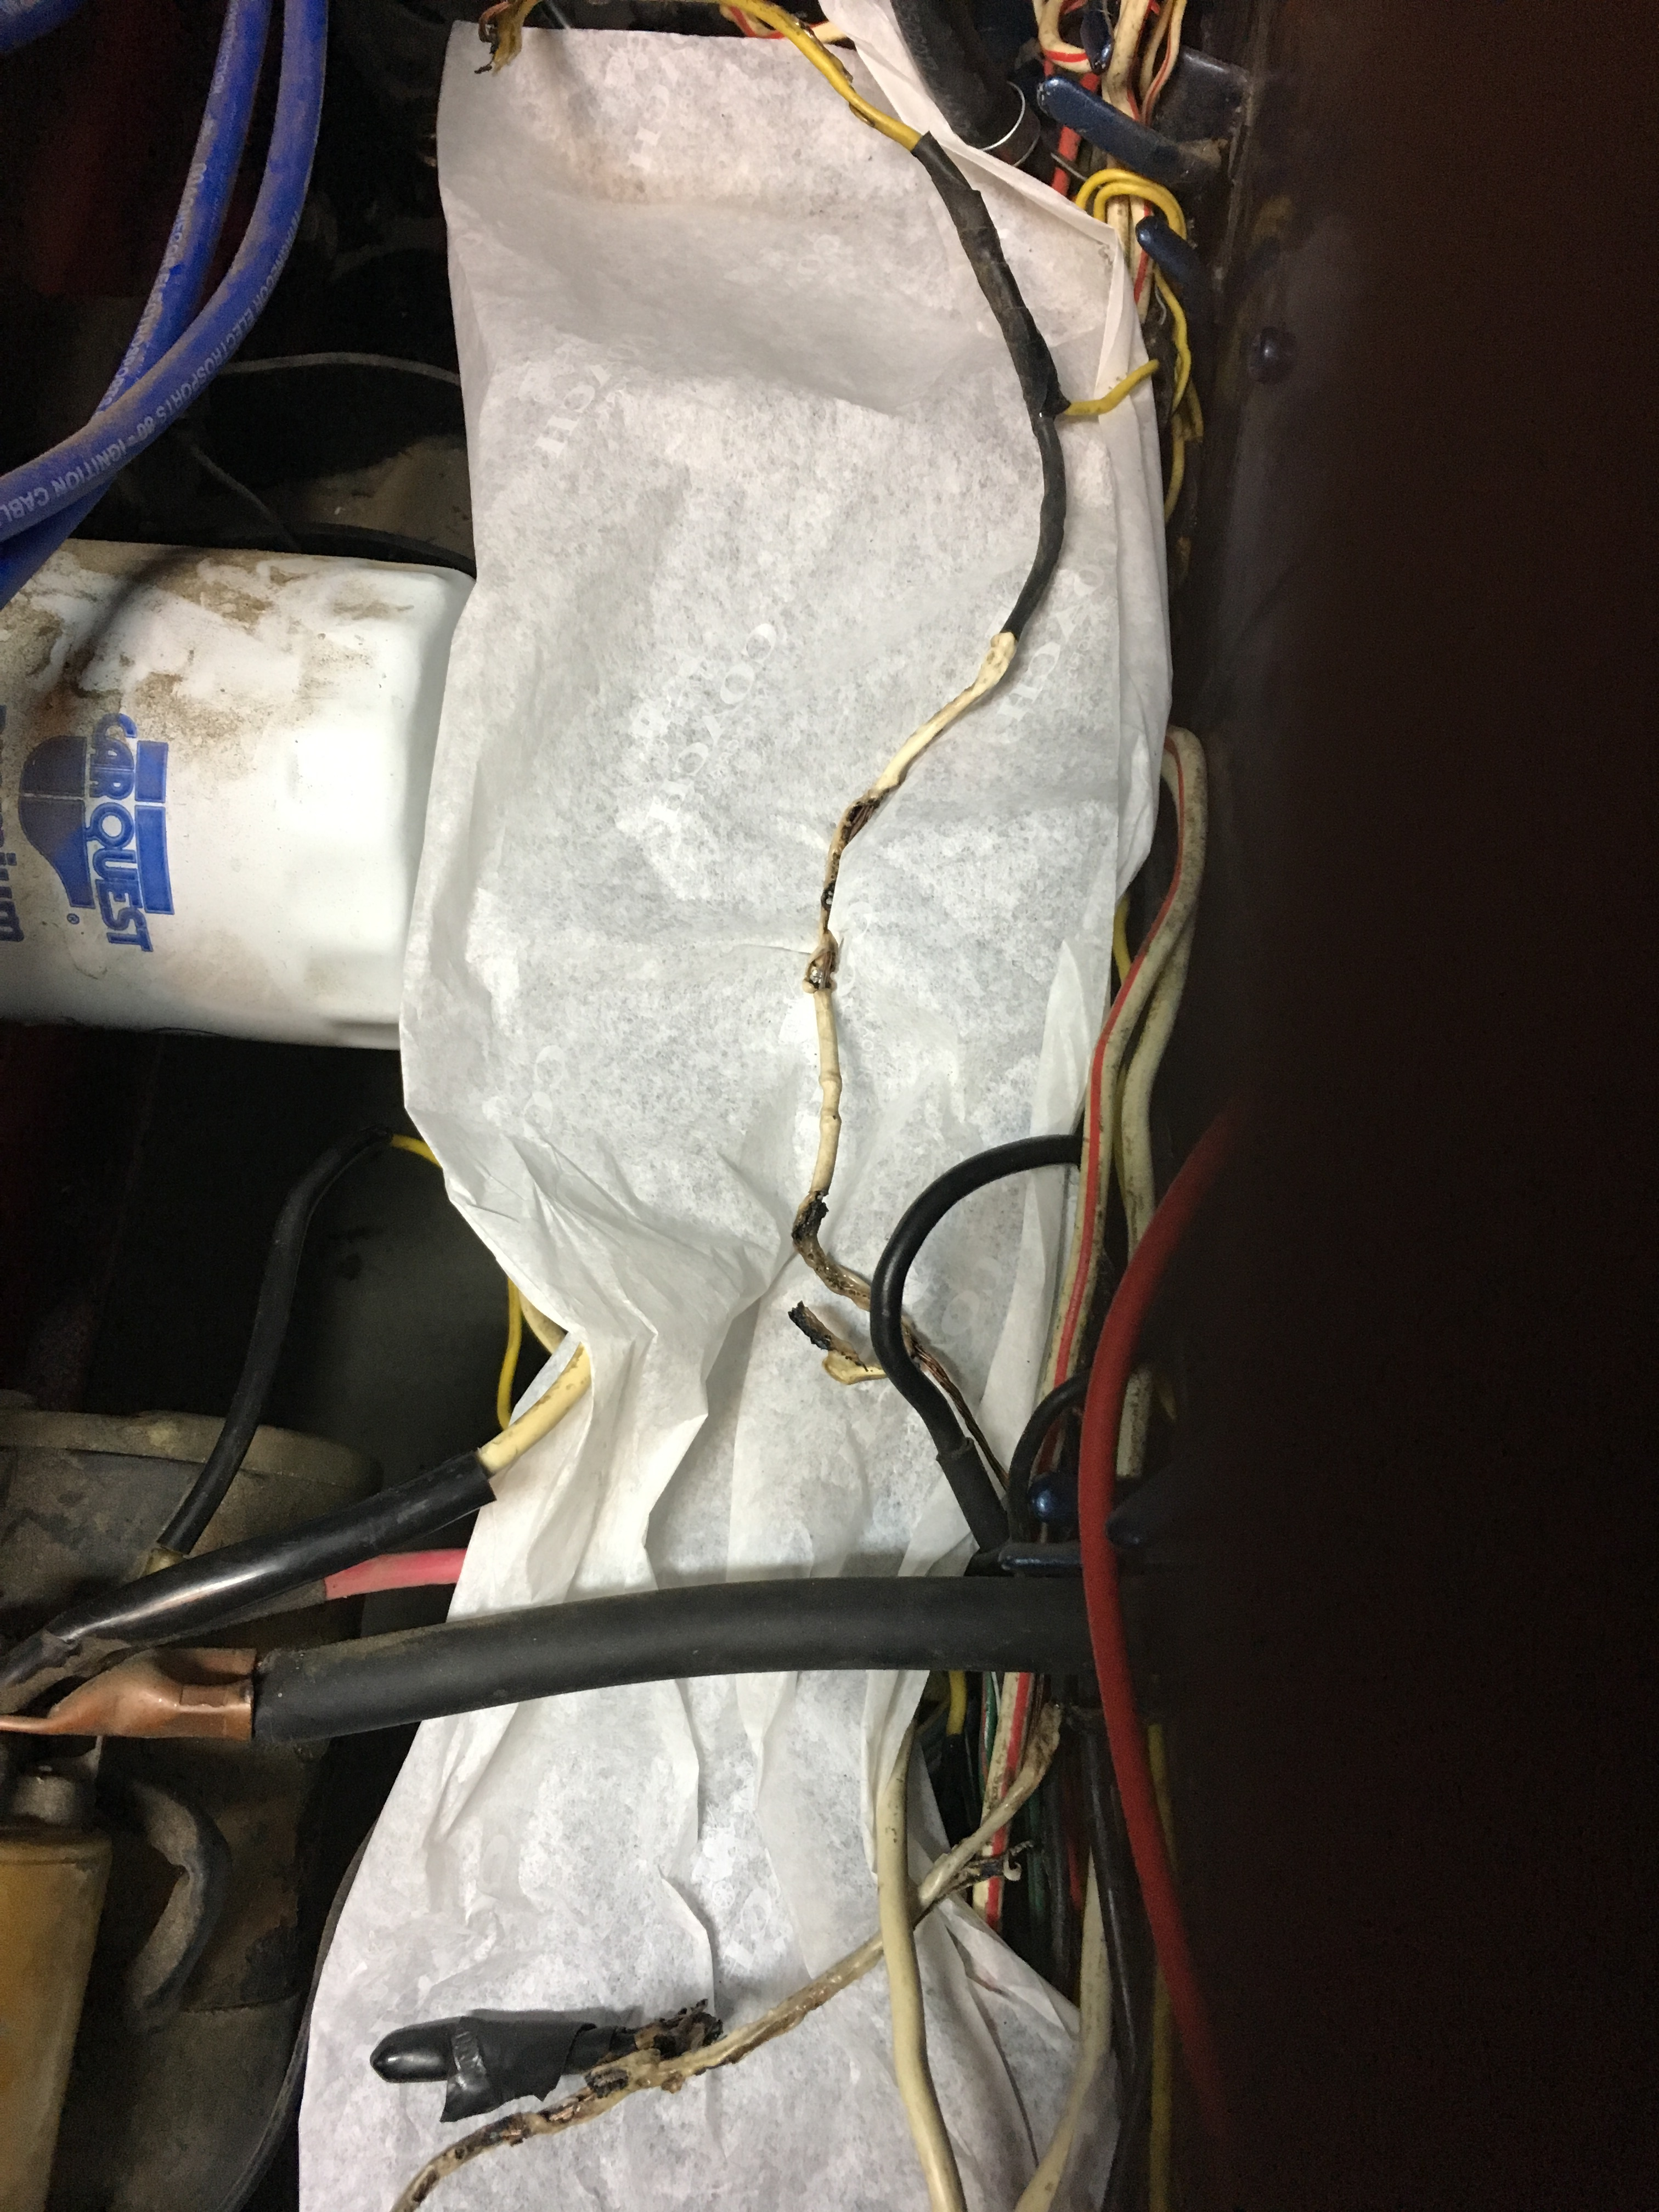 Datsun 260z Fuse Box Location Electrical Wiring Diagrams 280z Diagram Trusted 2012 Nissan Sentra Burnt